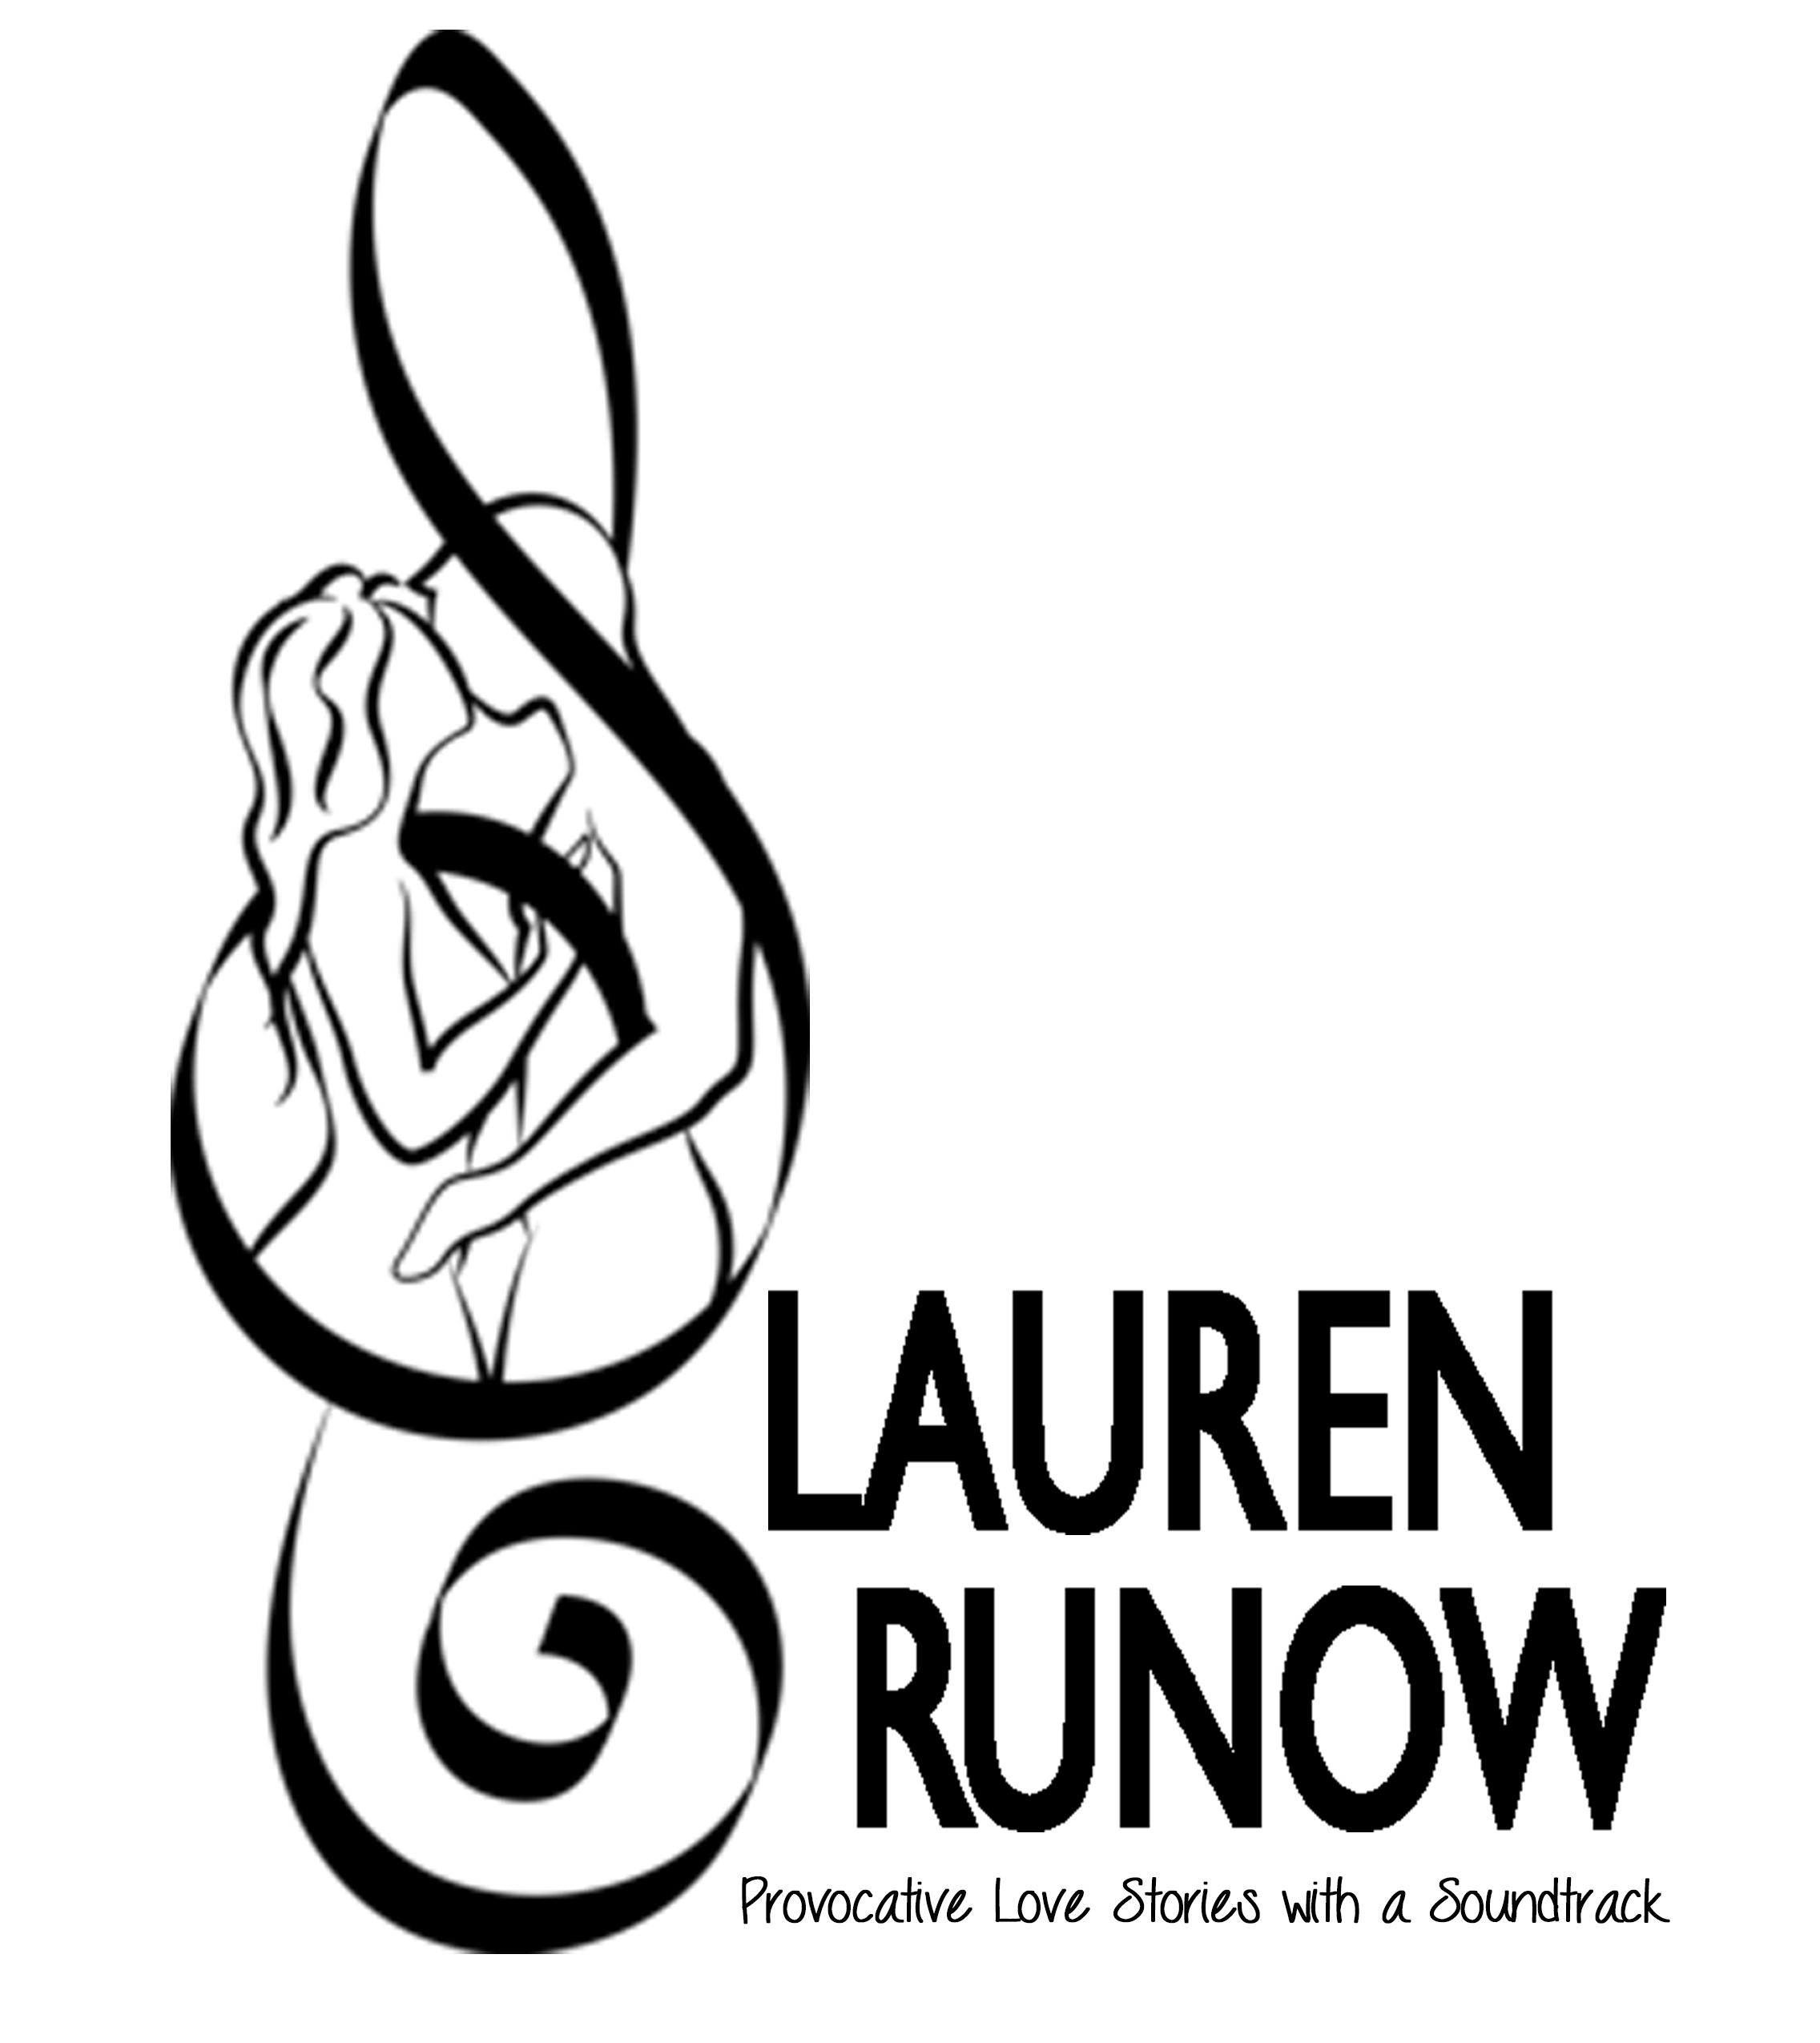 Lauren Runow logo.jpg